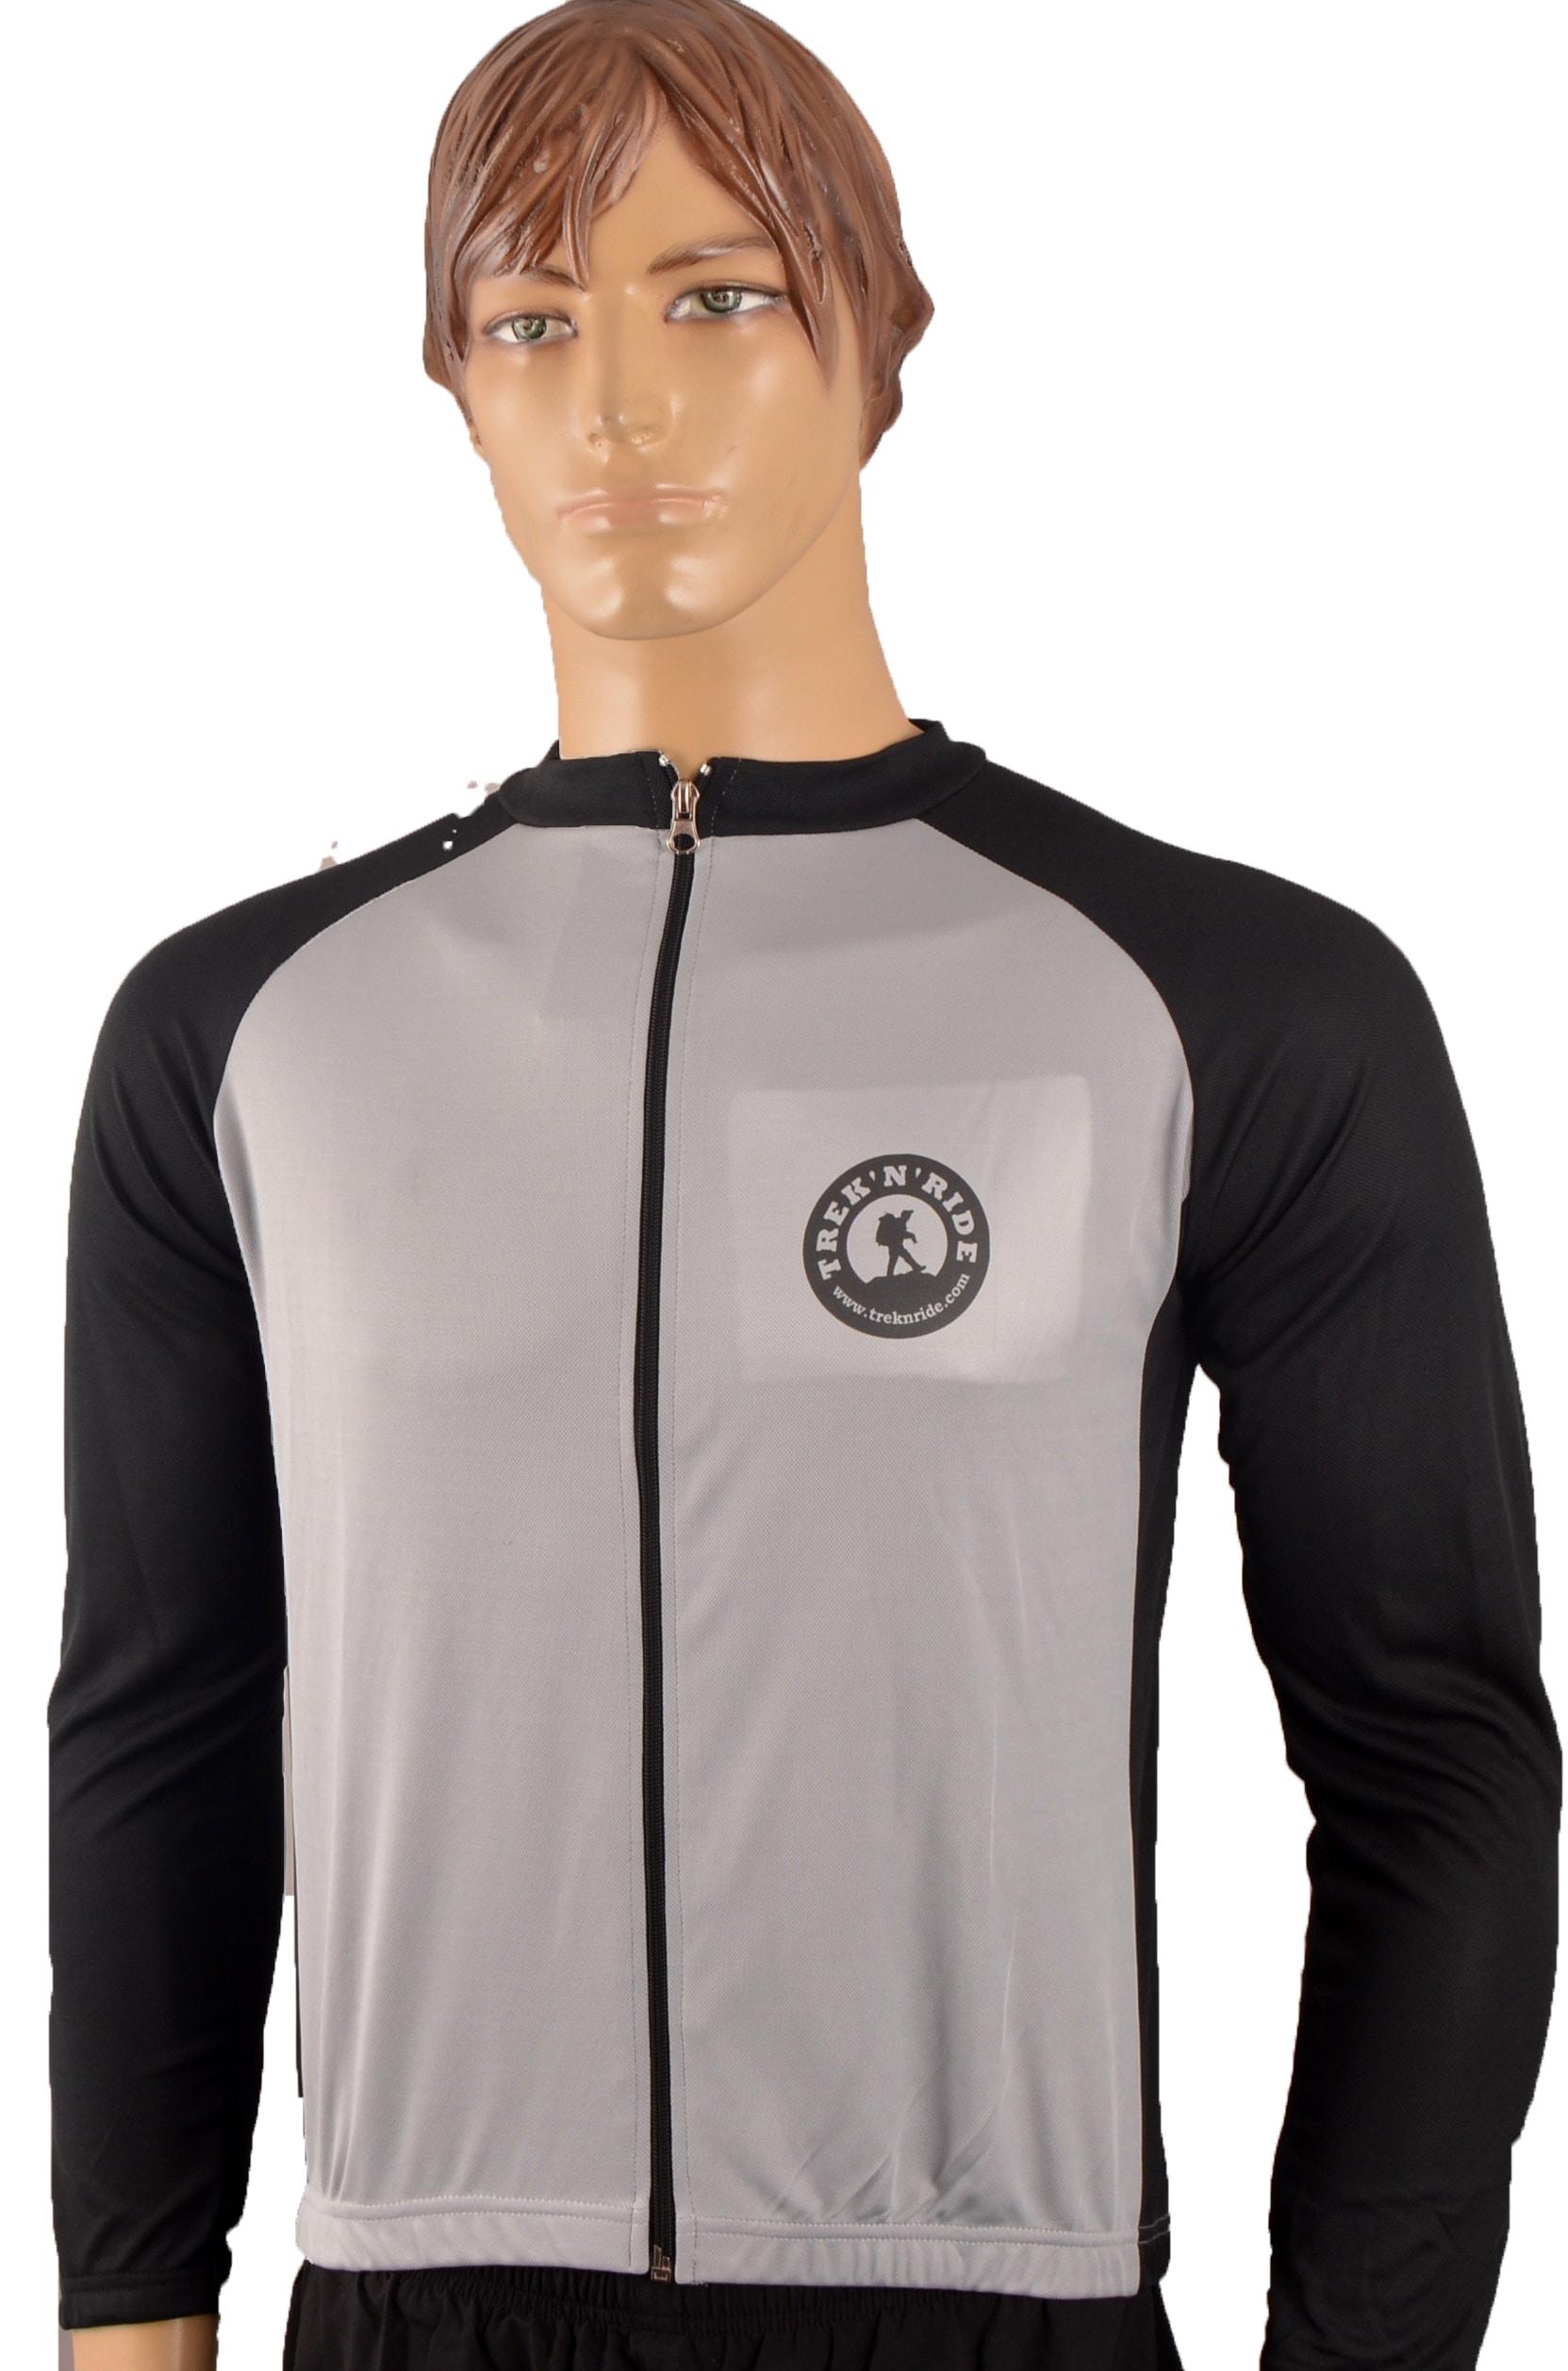 Full Sleeve Cycling Jersey TNR (Black & Grey,M) (Black & Grey,L)